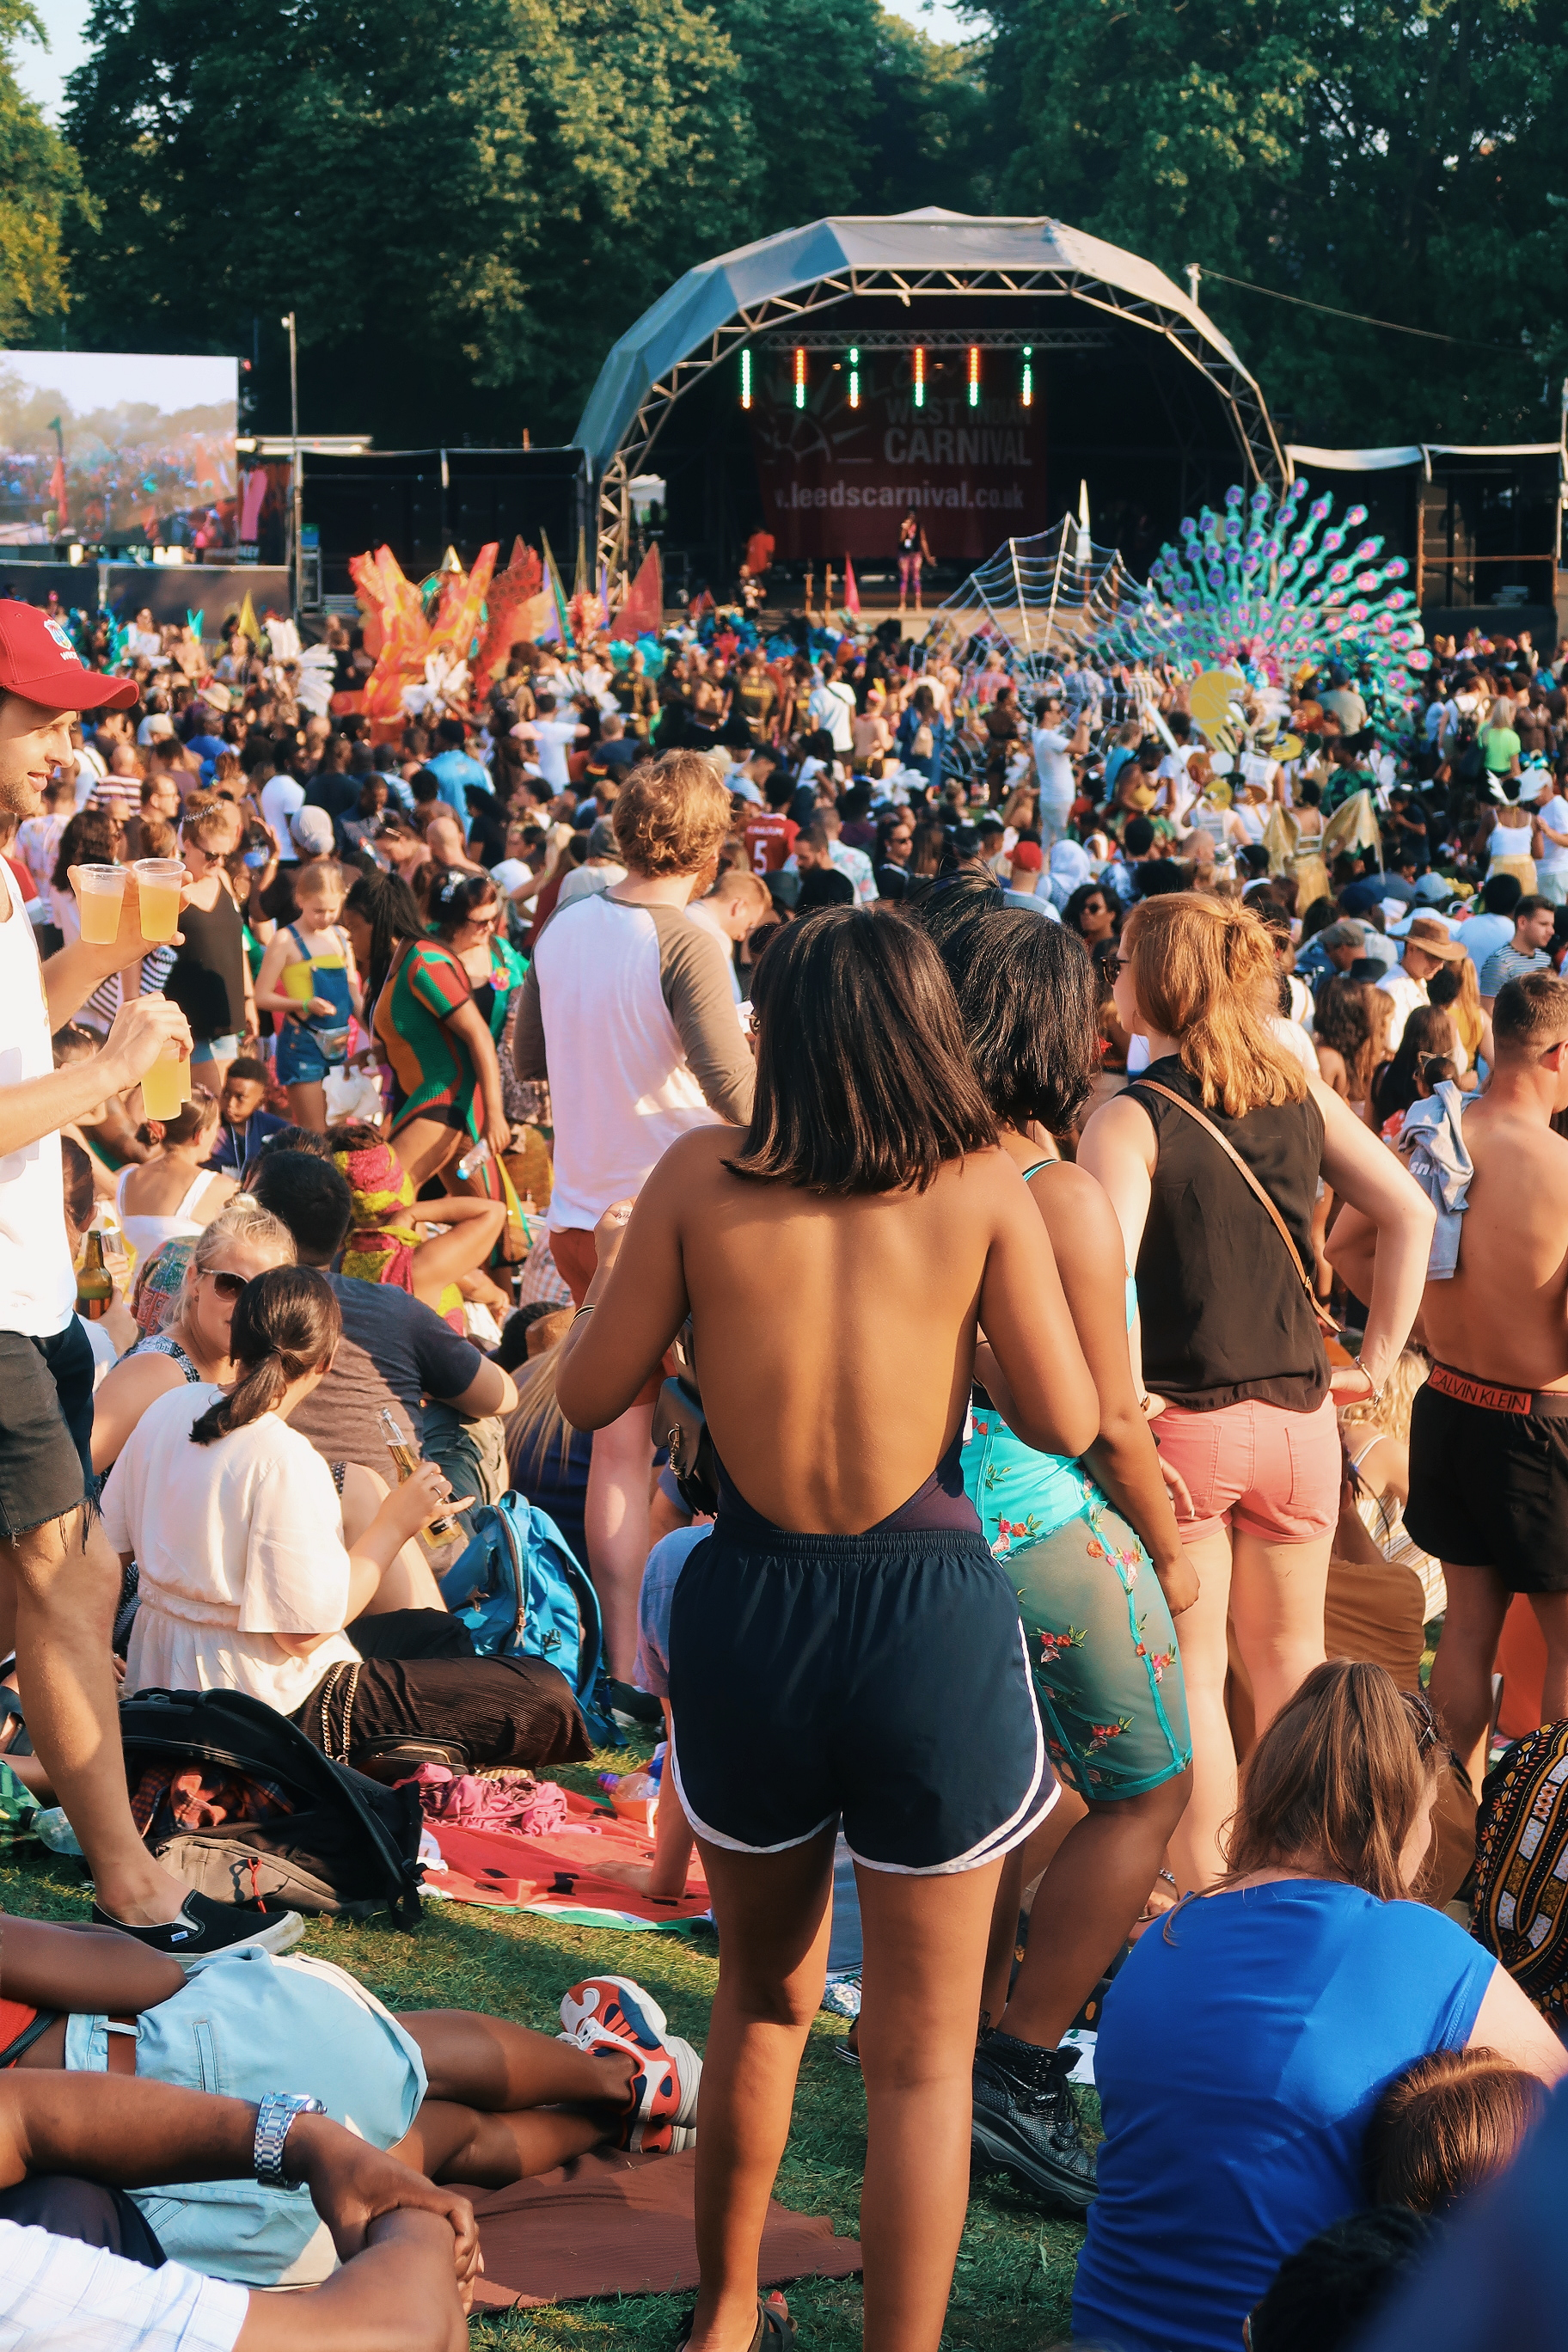 Leeds Caribbean Festival